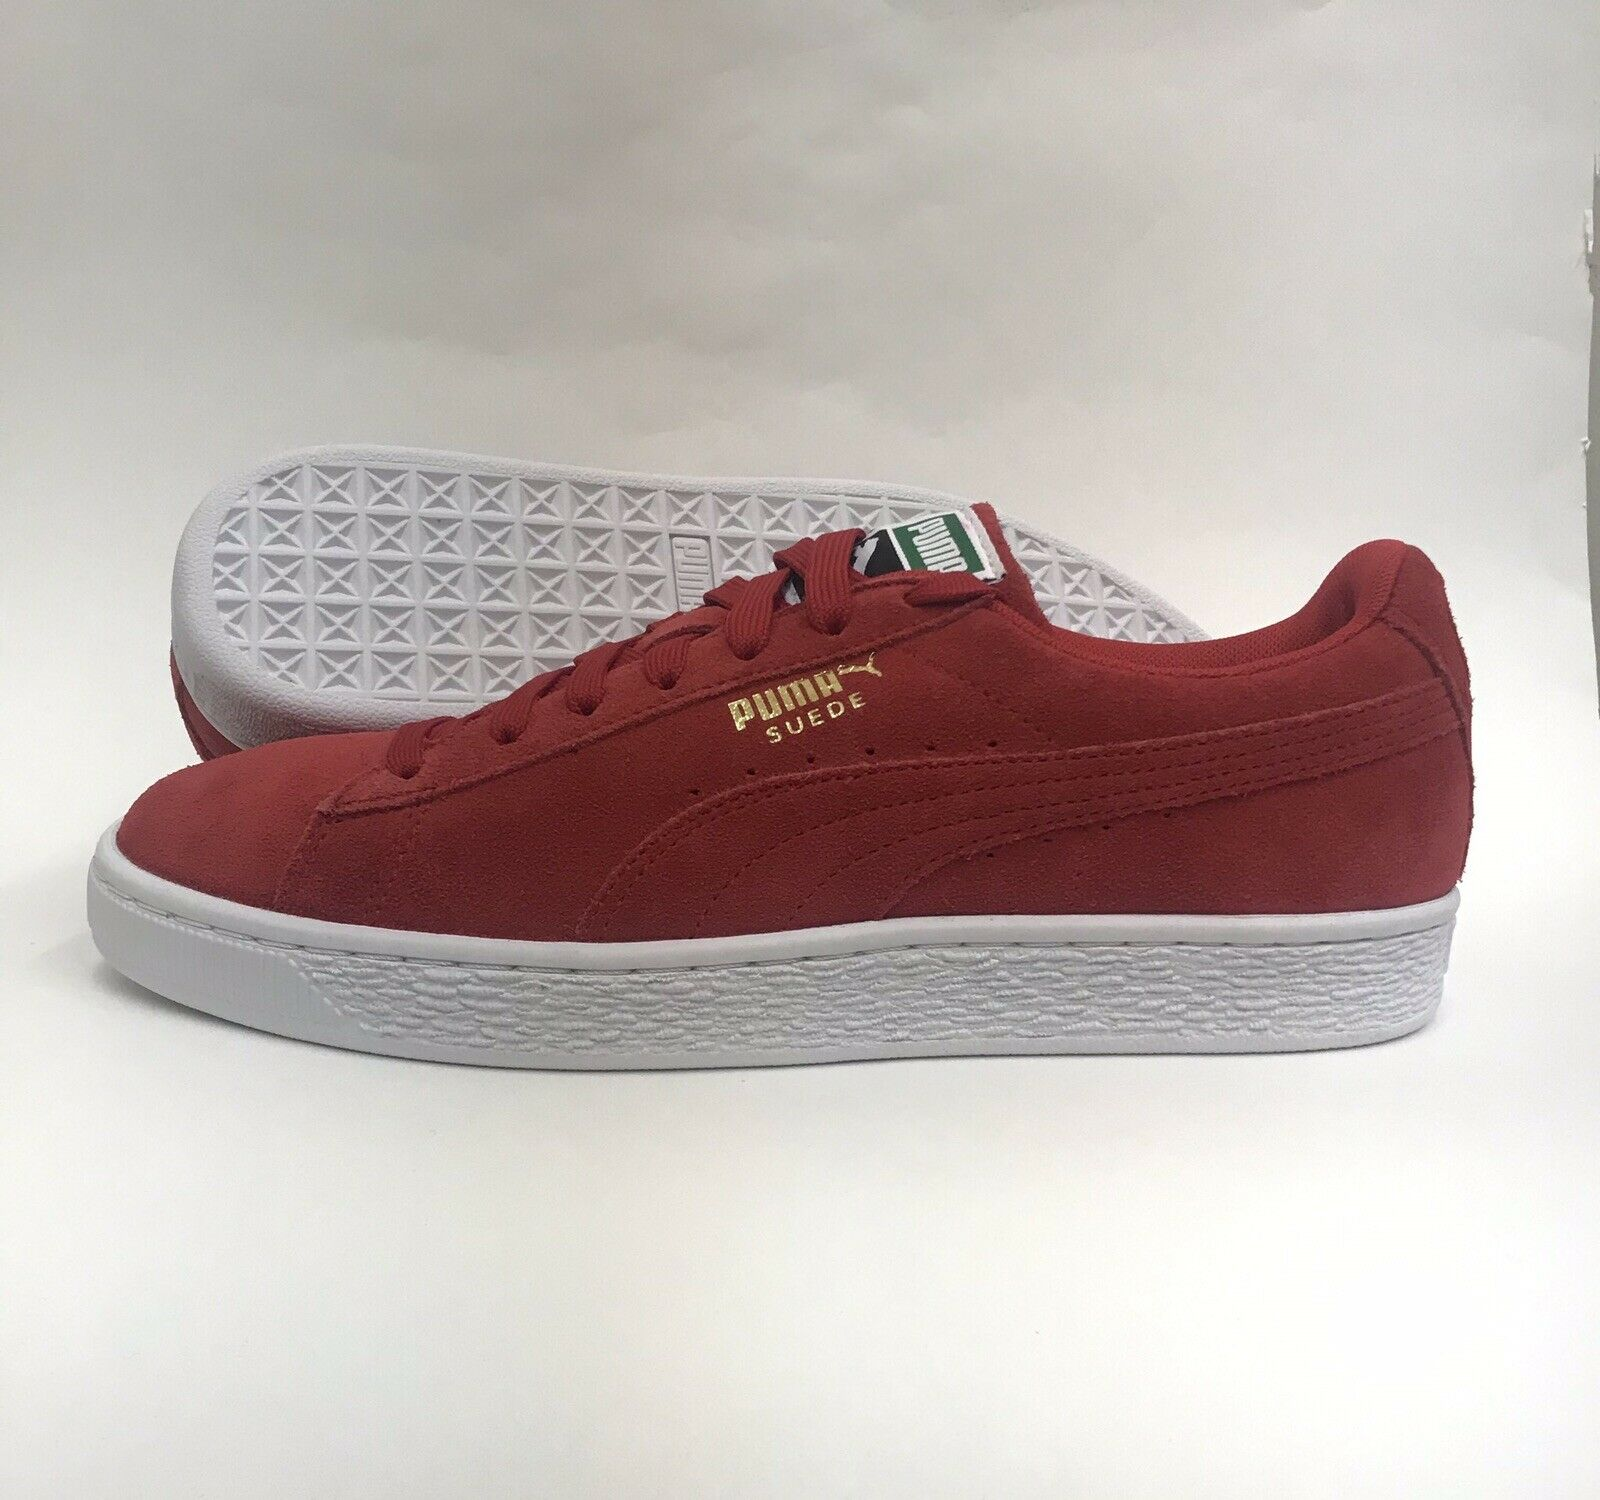 NIB Men's PUMA 356568 63 Red Suede Classic shoes Sz 11.5